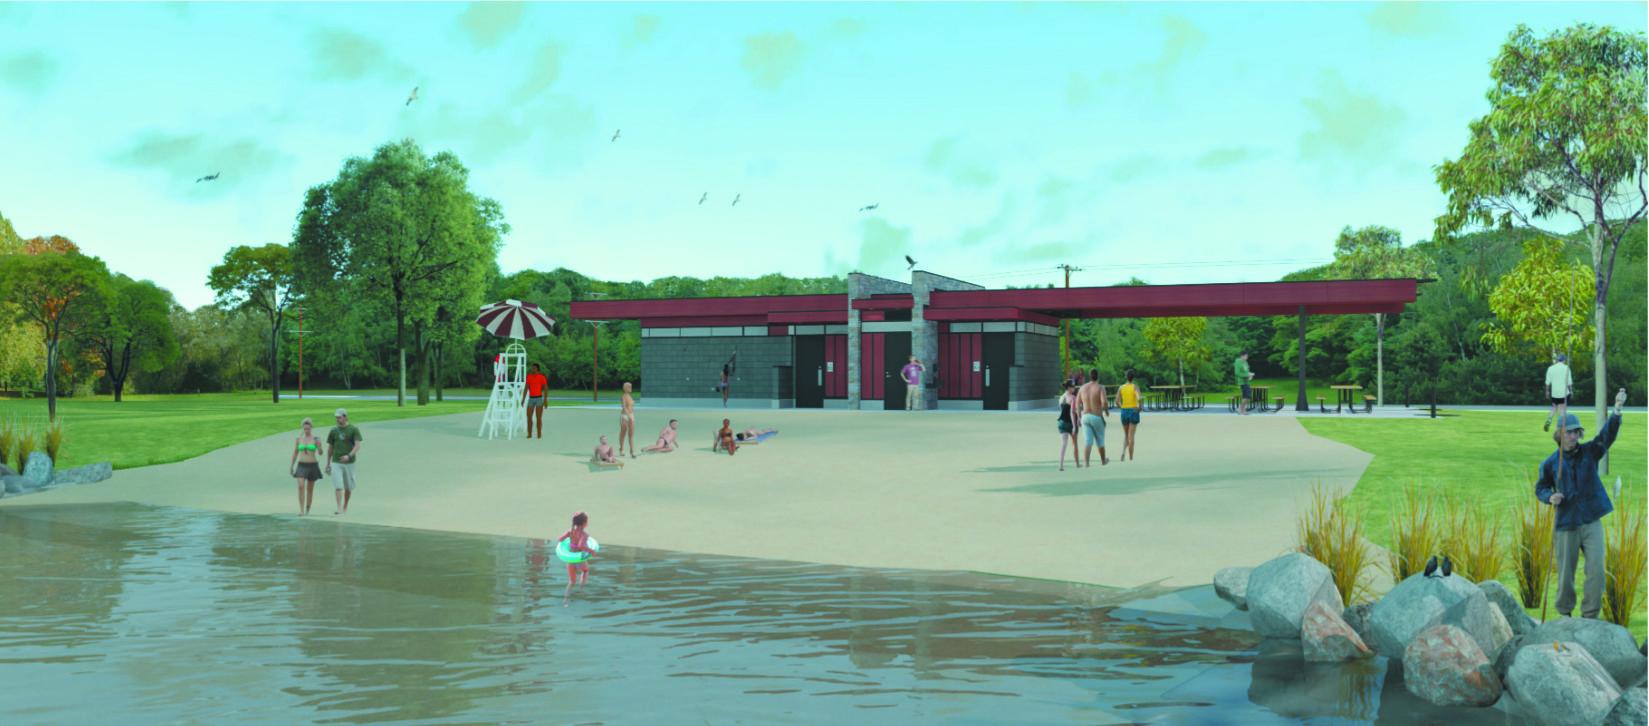 Warner Beach bathhouse construction moving forward | Northside News